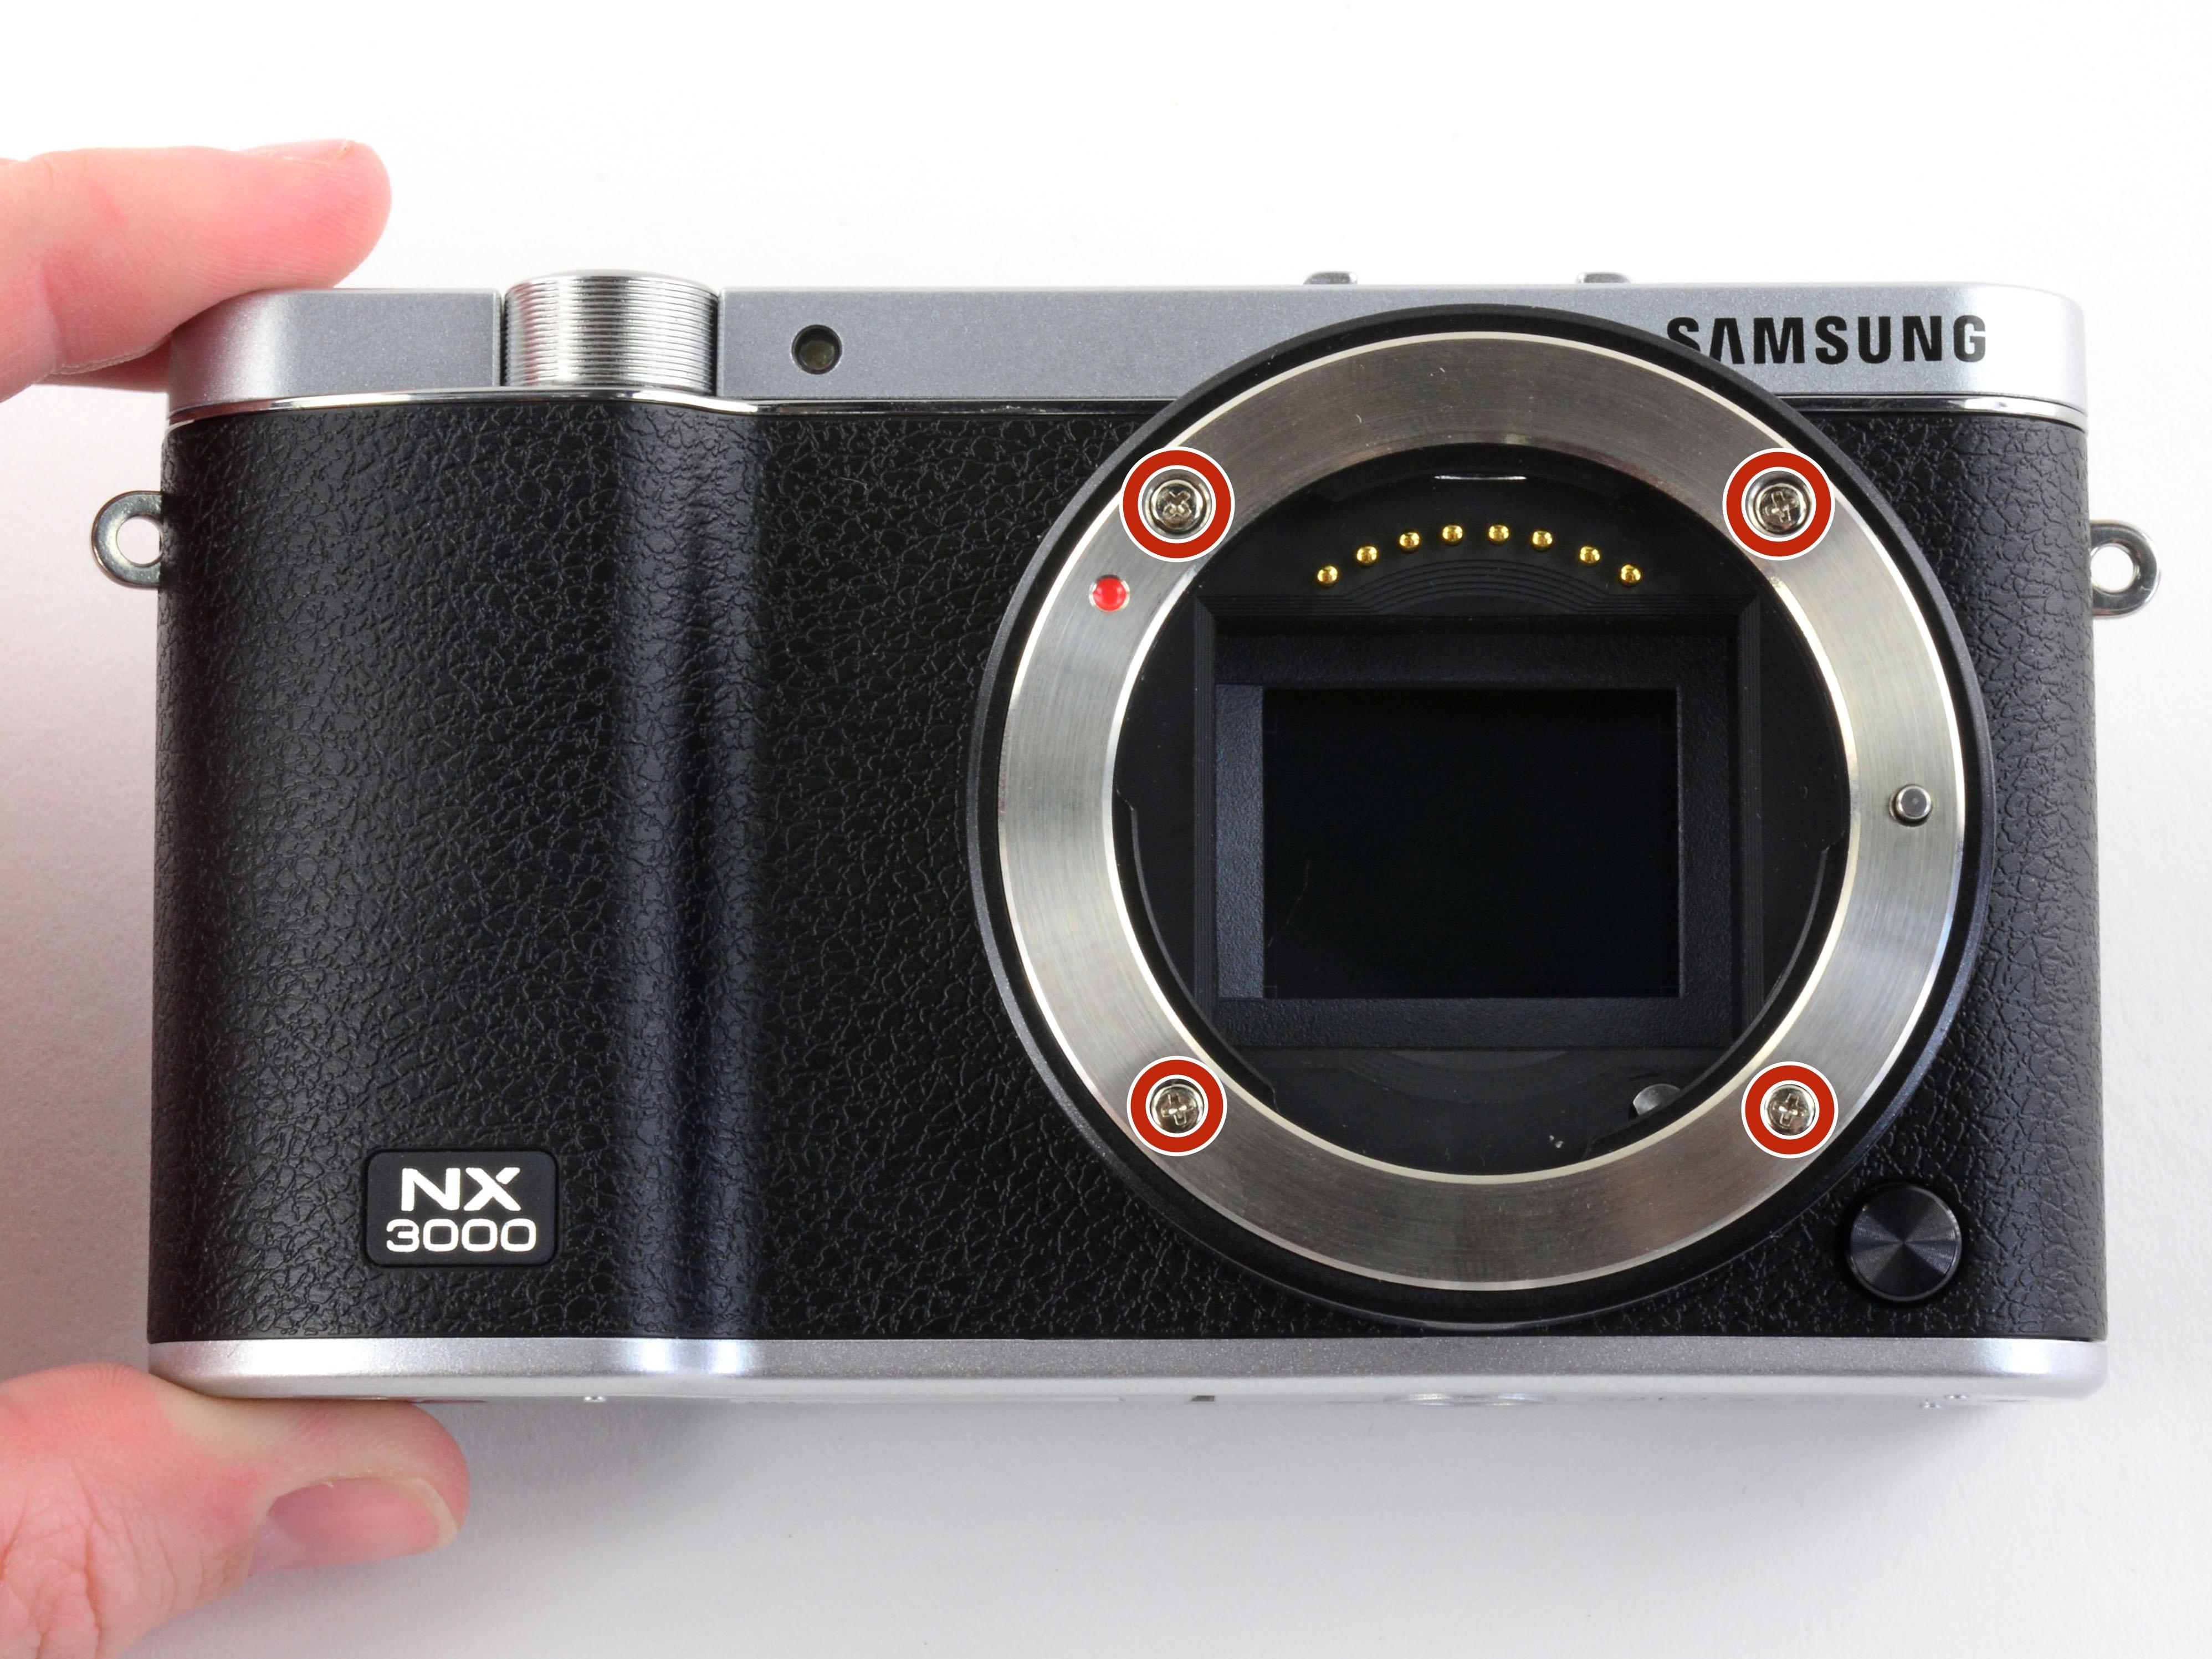 Samsung NX3000 Repair - iFixit